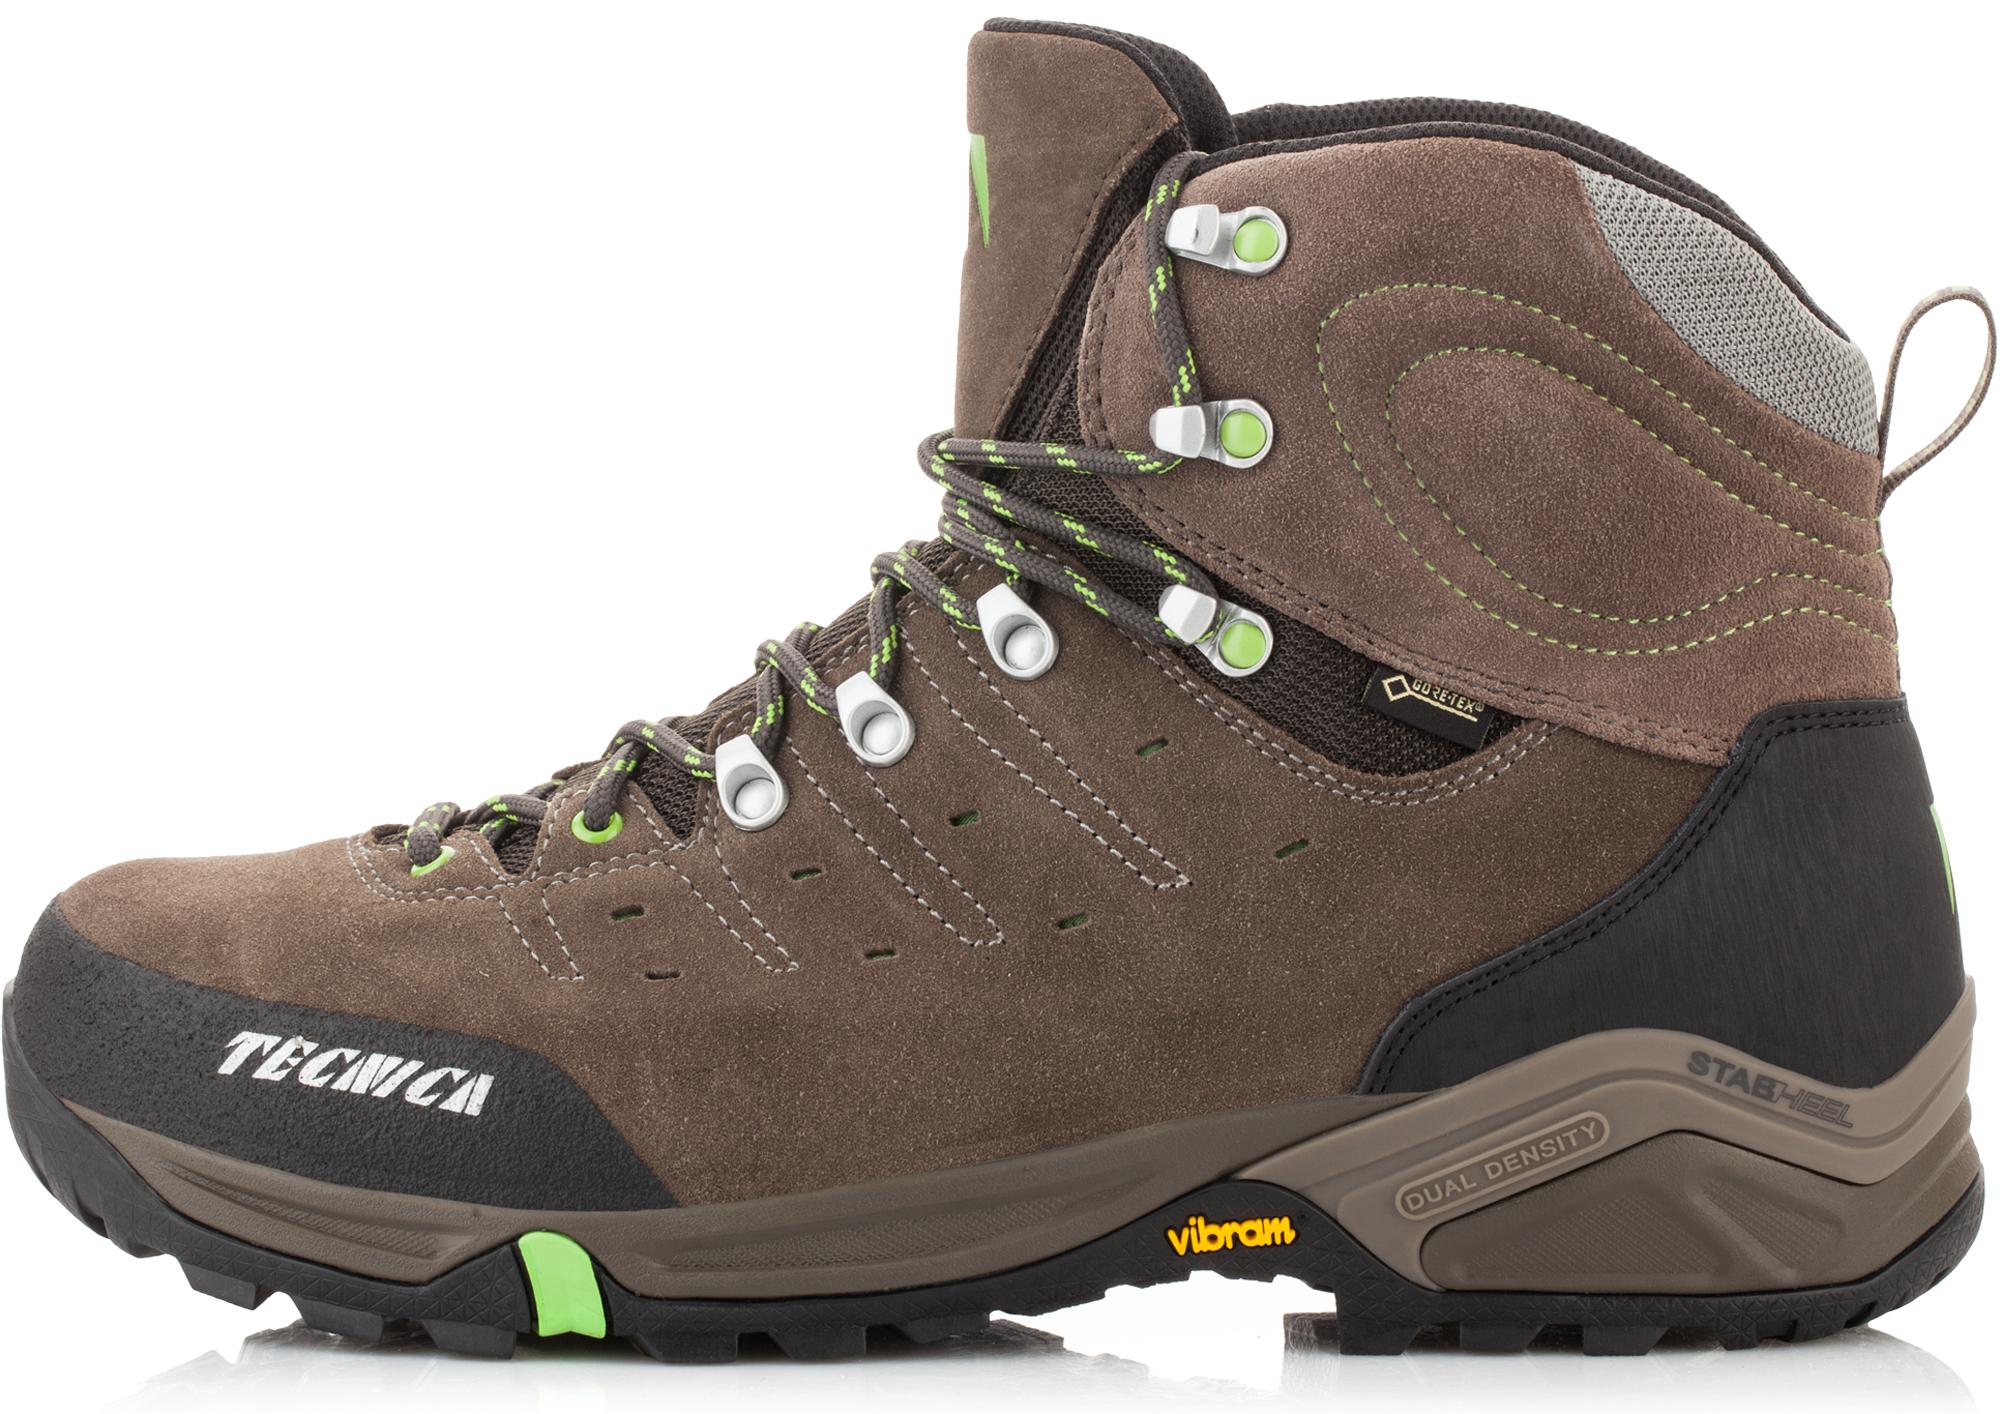 Tecnica Ботинки мужские Aconcagua II GTX, размер 44